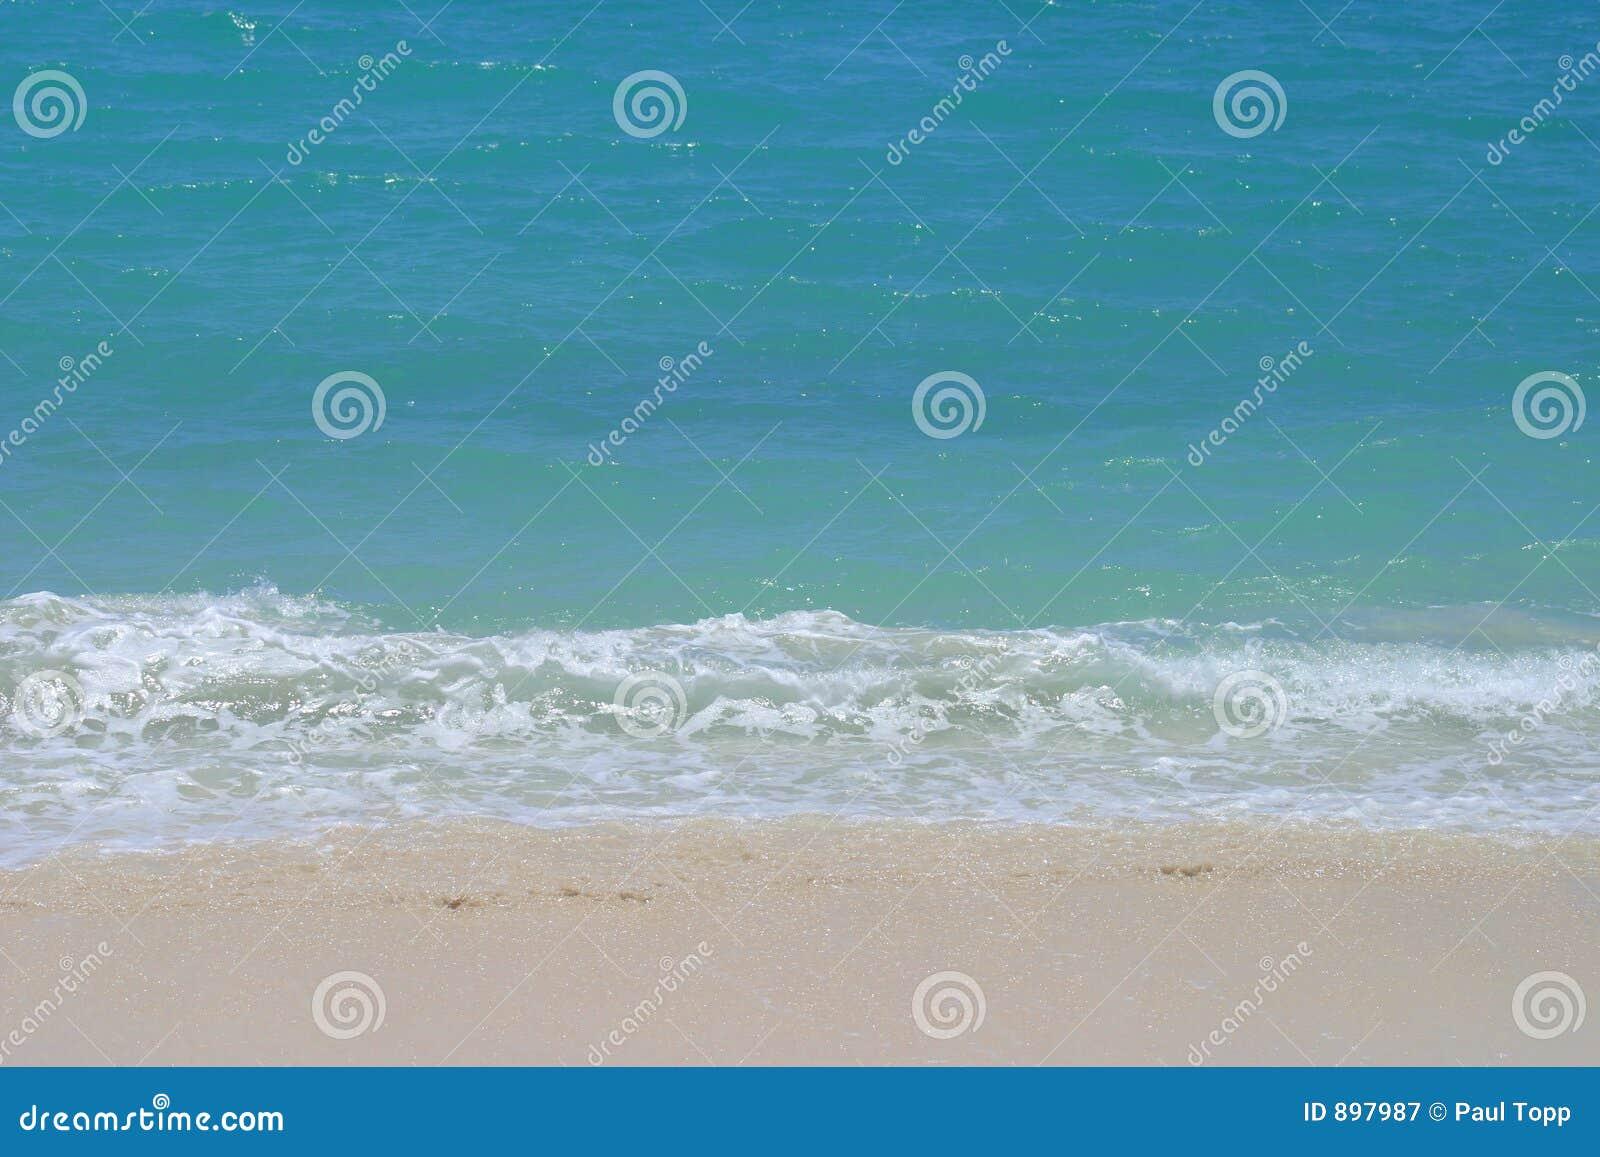 Delikatne Hawaii fale plażowych